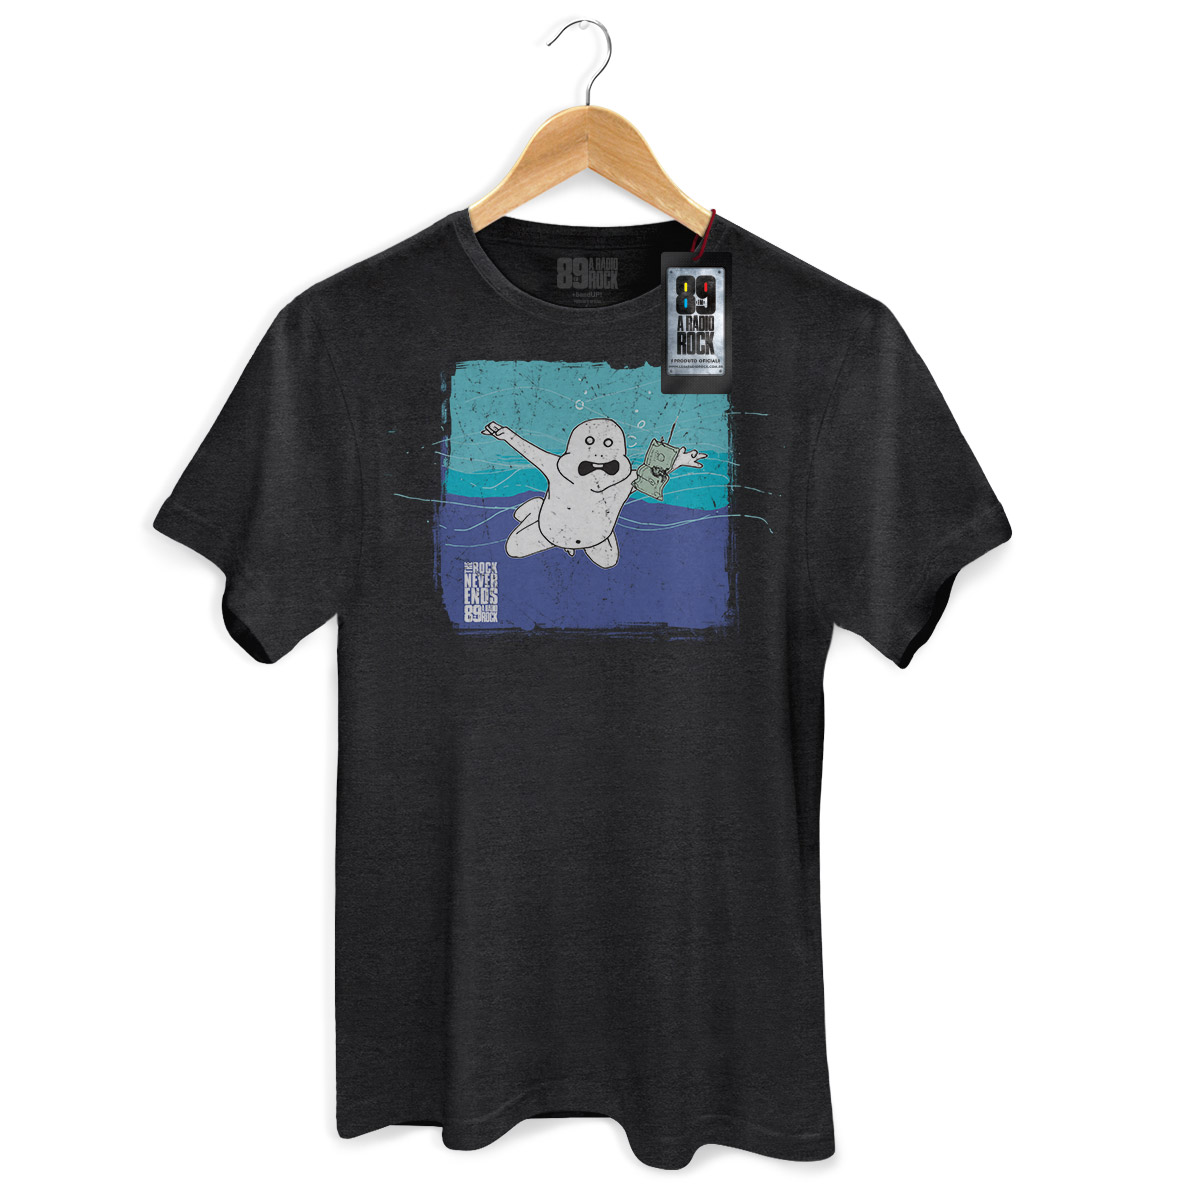 Camiseta Masculina 89FM A Rádio Rock Nirvana Never Ends